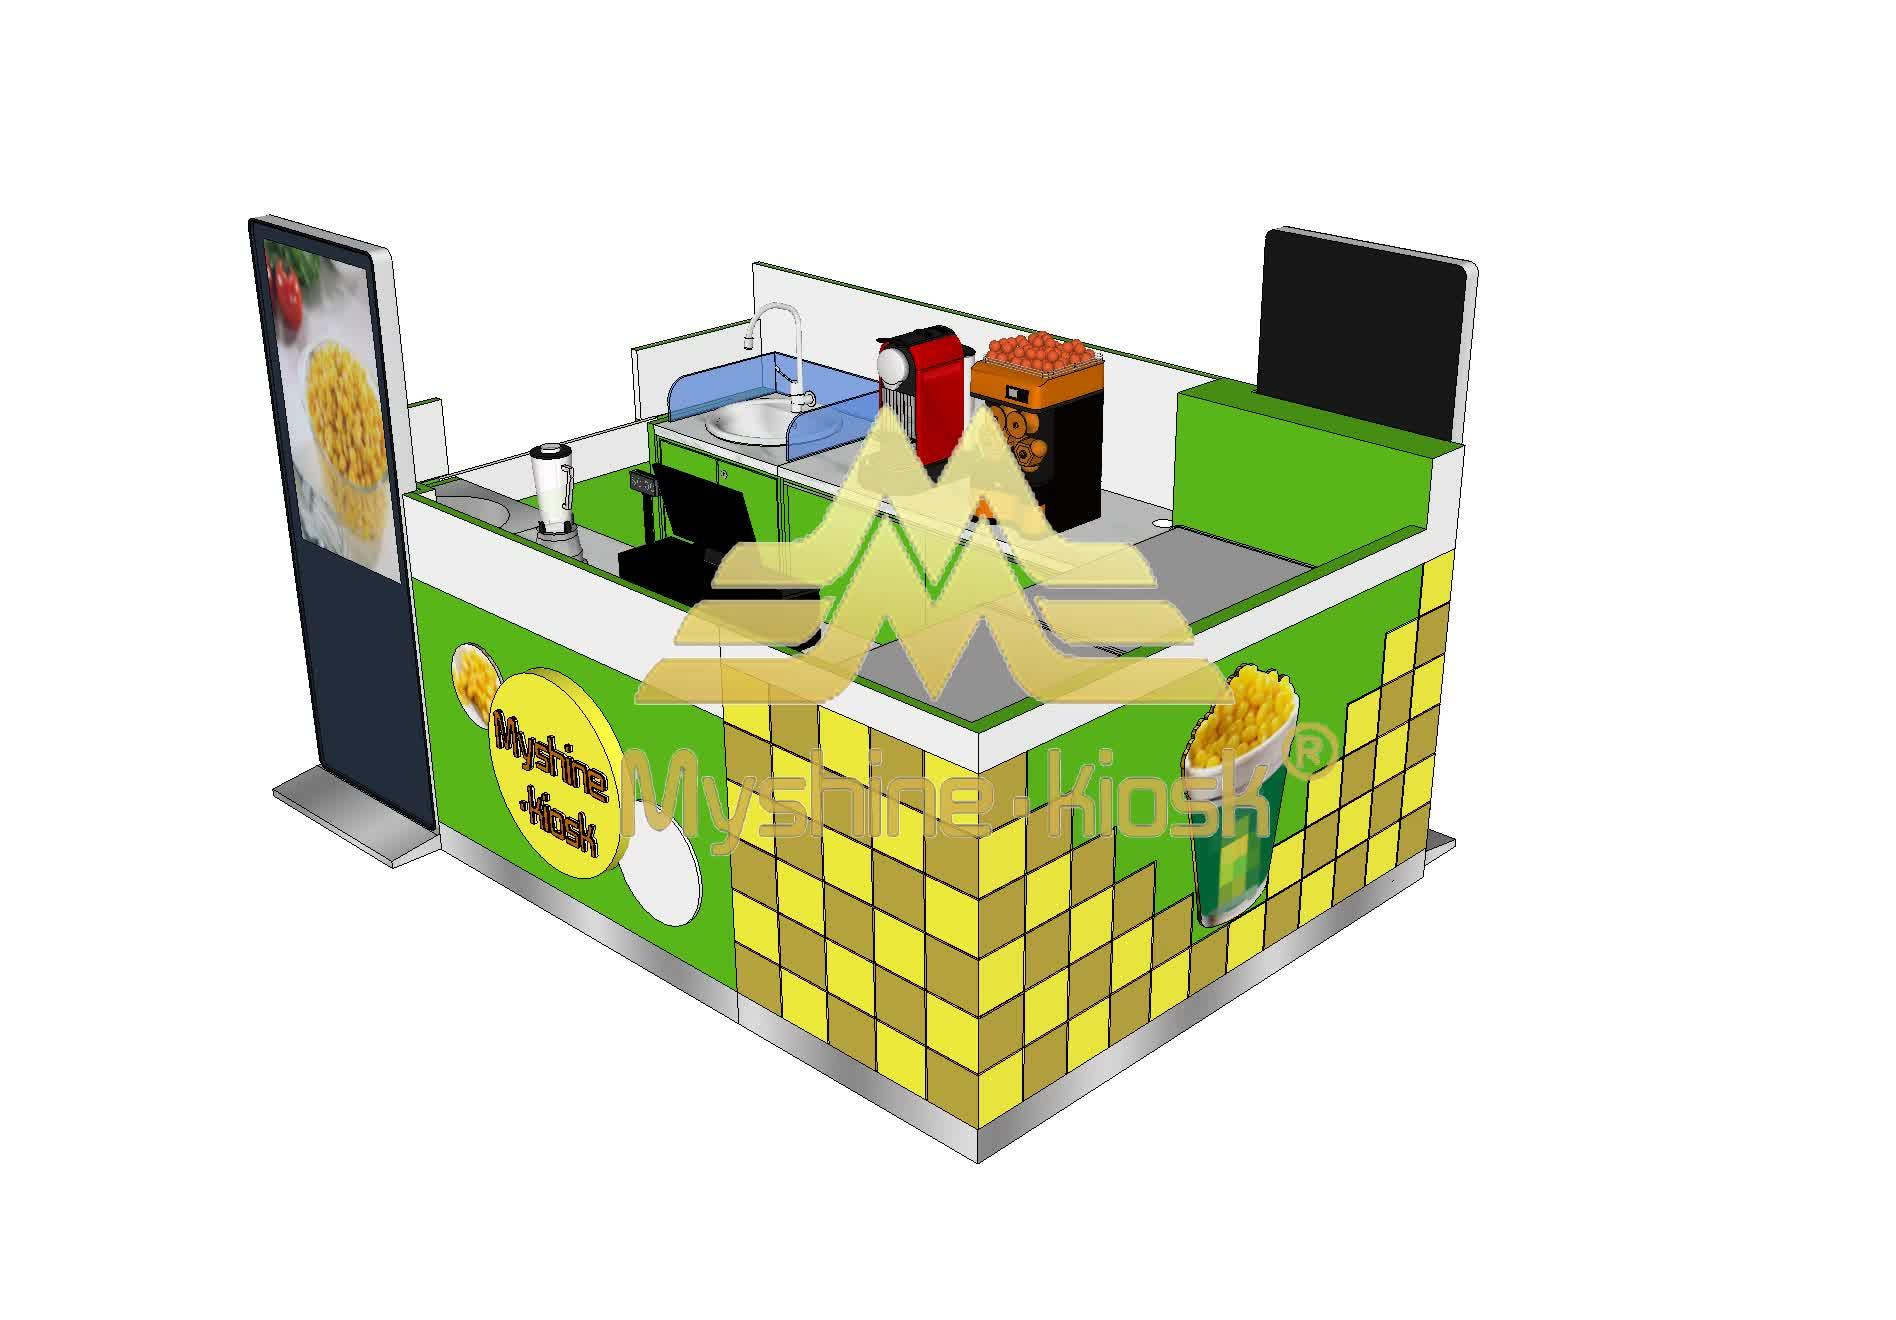 Disesuaikan Jagung Manis Kios Panggang Popcorn Kios Pop Corn Kios Di Pusat Perbelanjaan